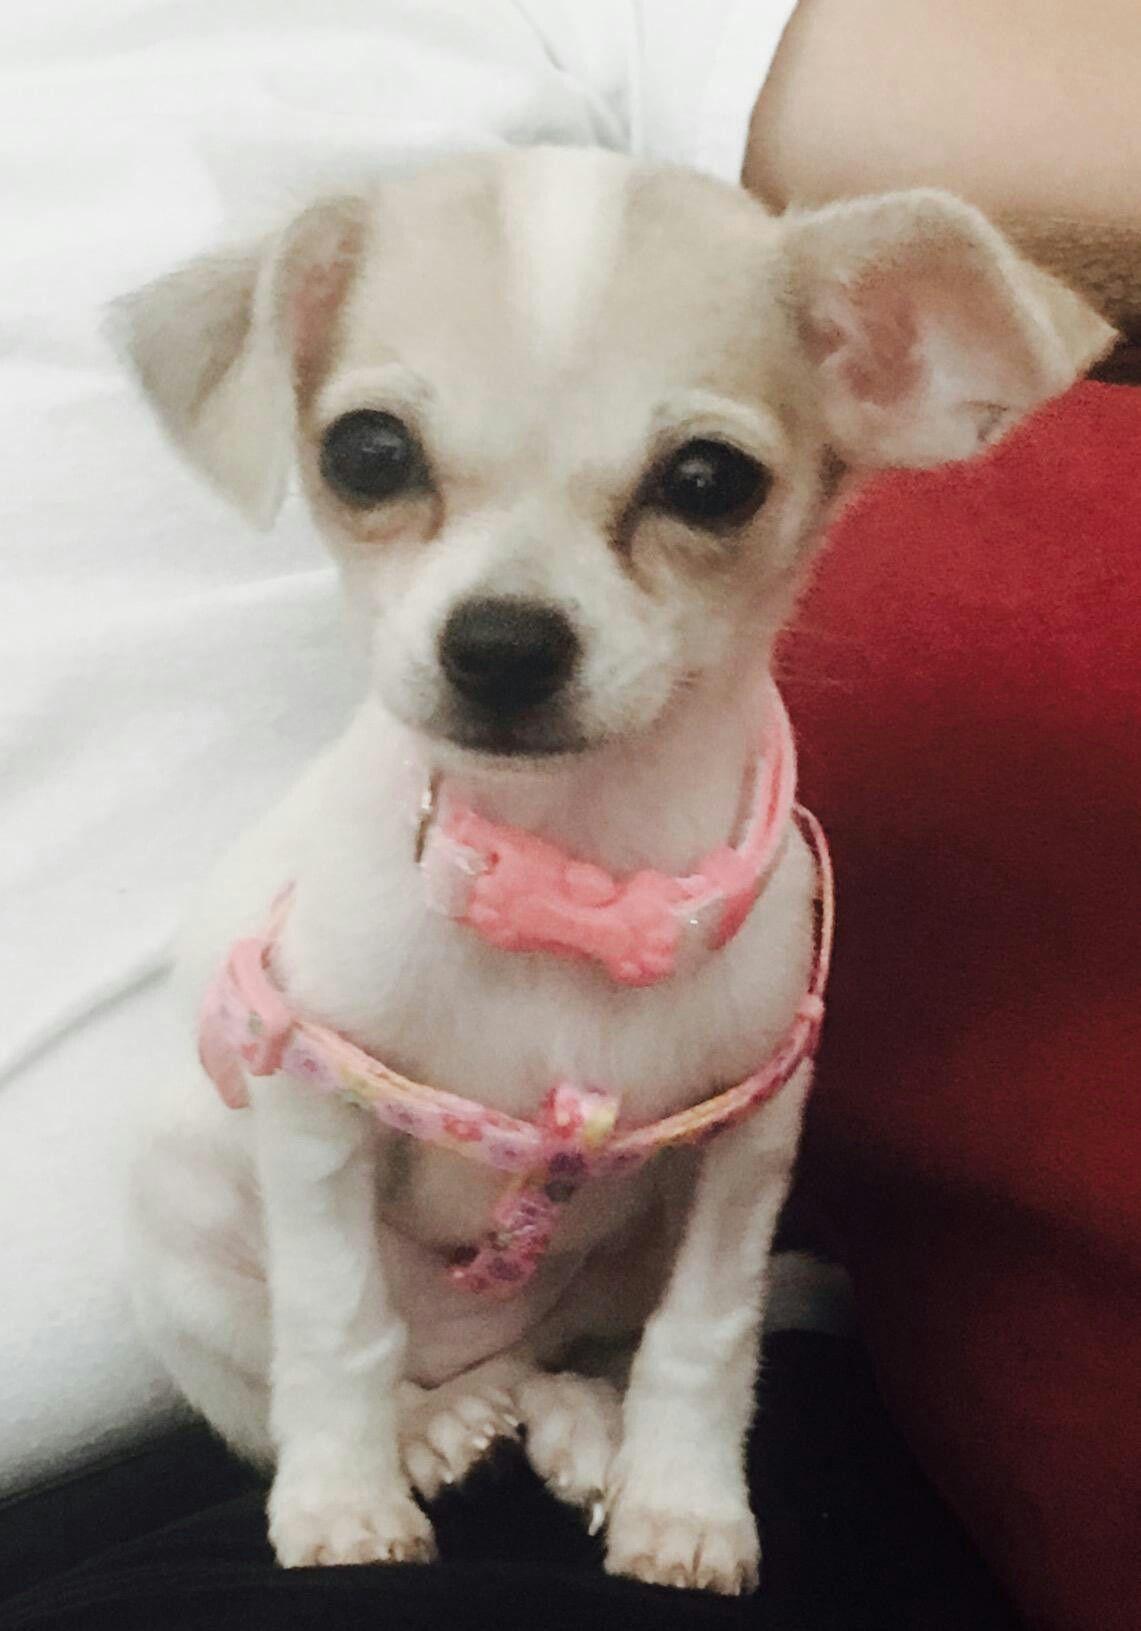 12 Week Old Chihuahua Thayler Chihuahua Love Chihuahua Animals